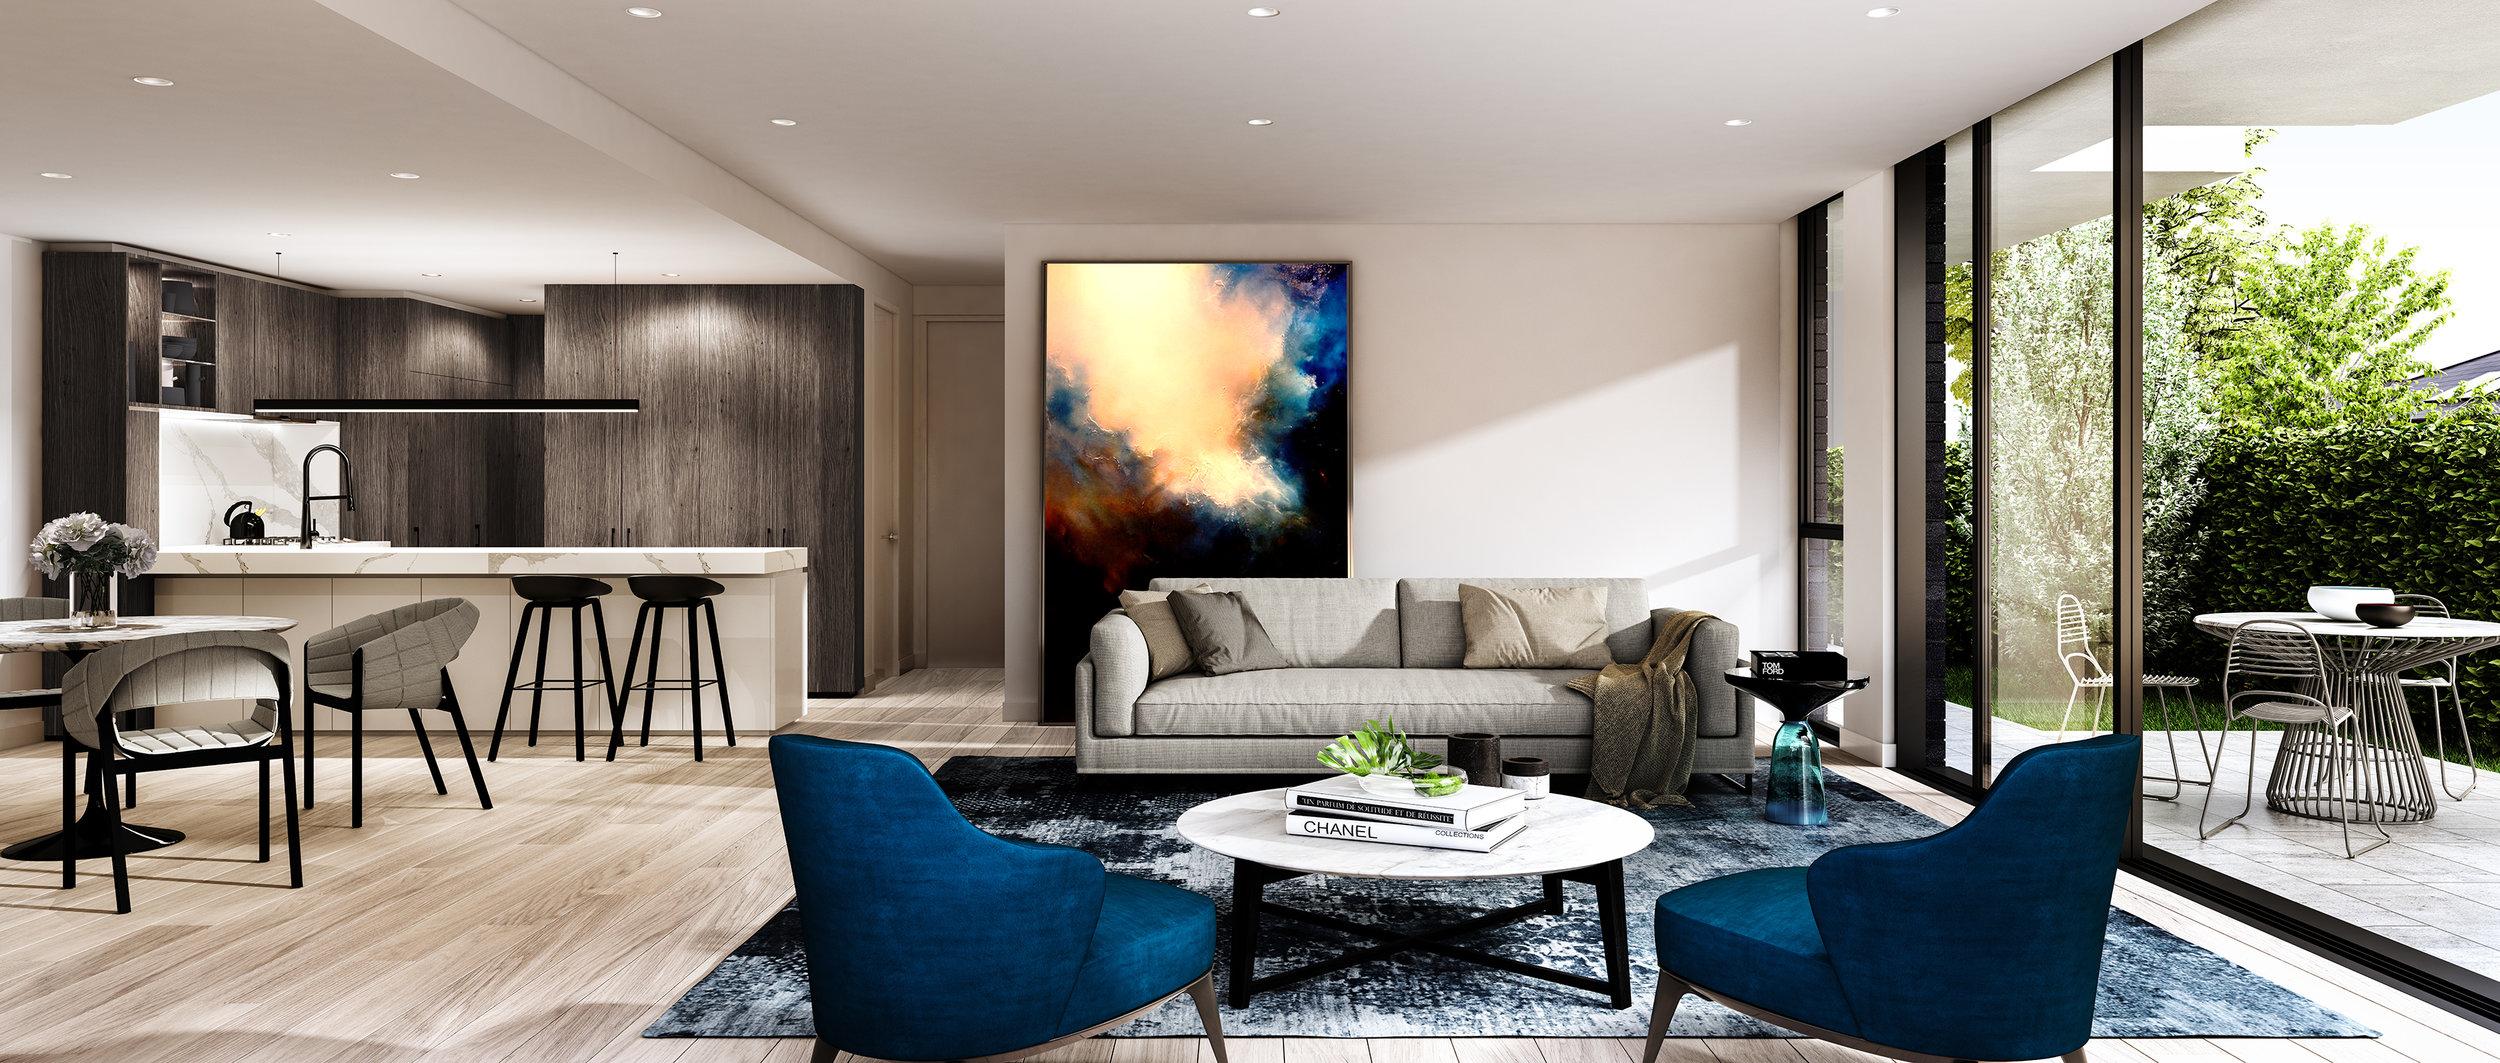 Southbay - Unit 1.10 Living Room MR.jpg